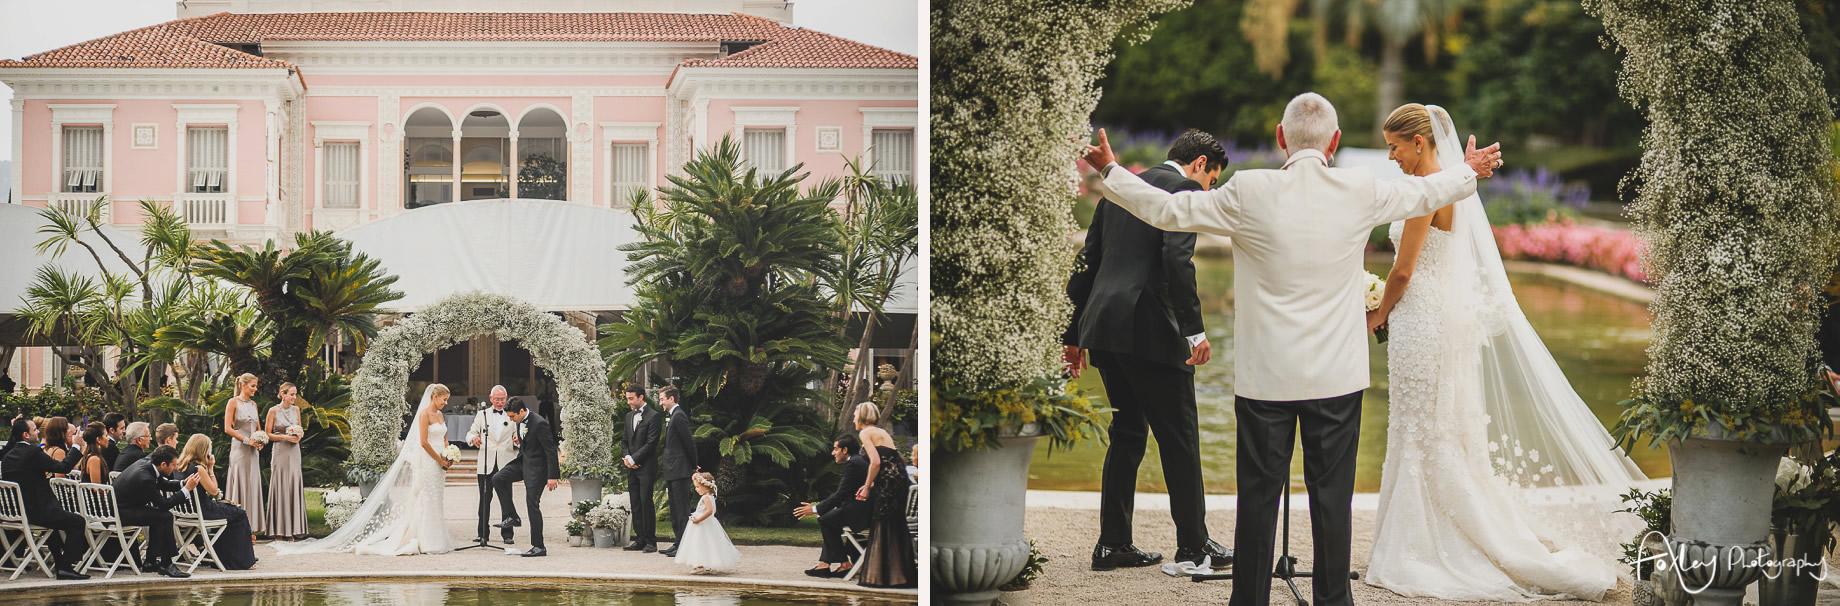 Jil and Will's Wedding at Villa Ephrussi De Rothschild 118